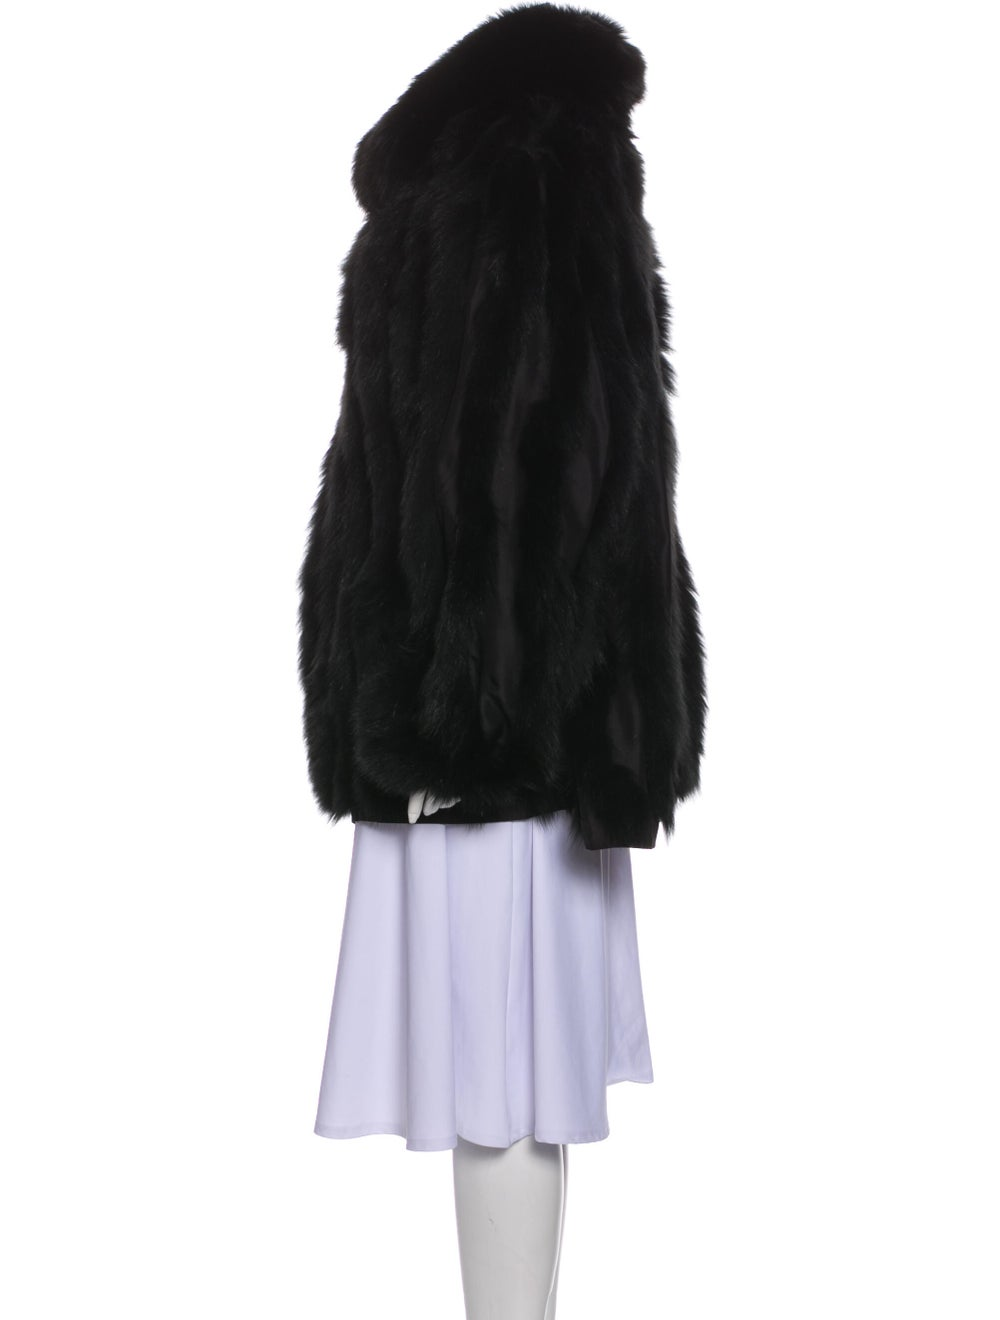 Fur Coat Black - image 2